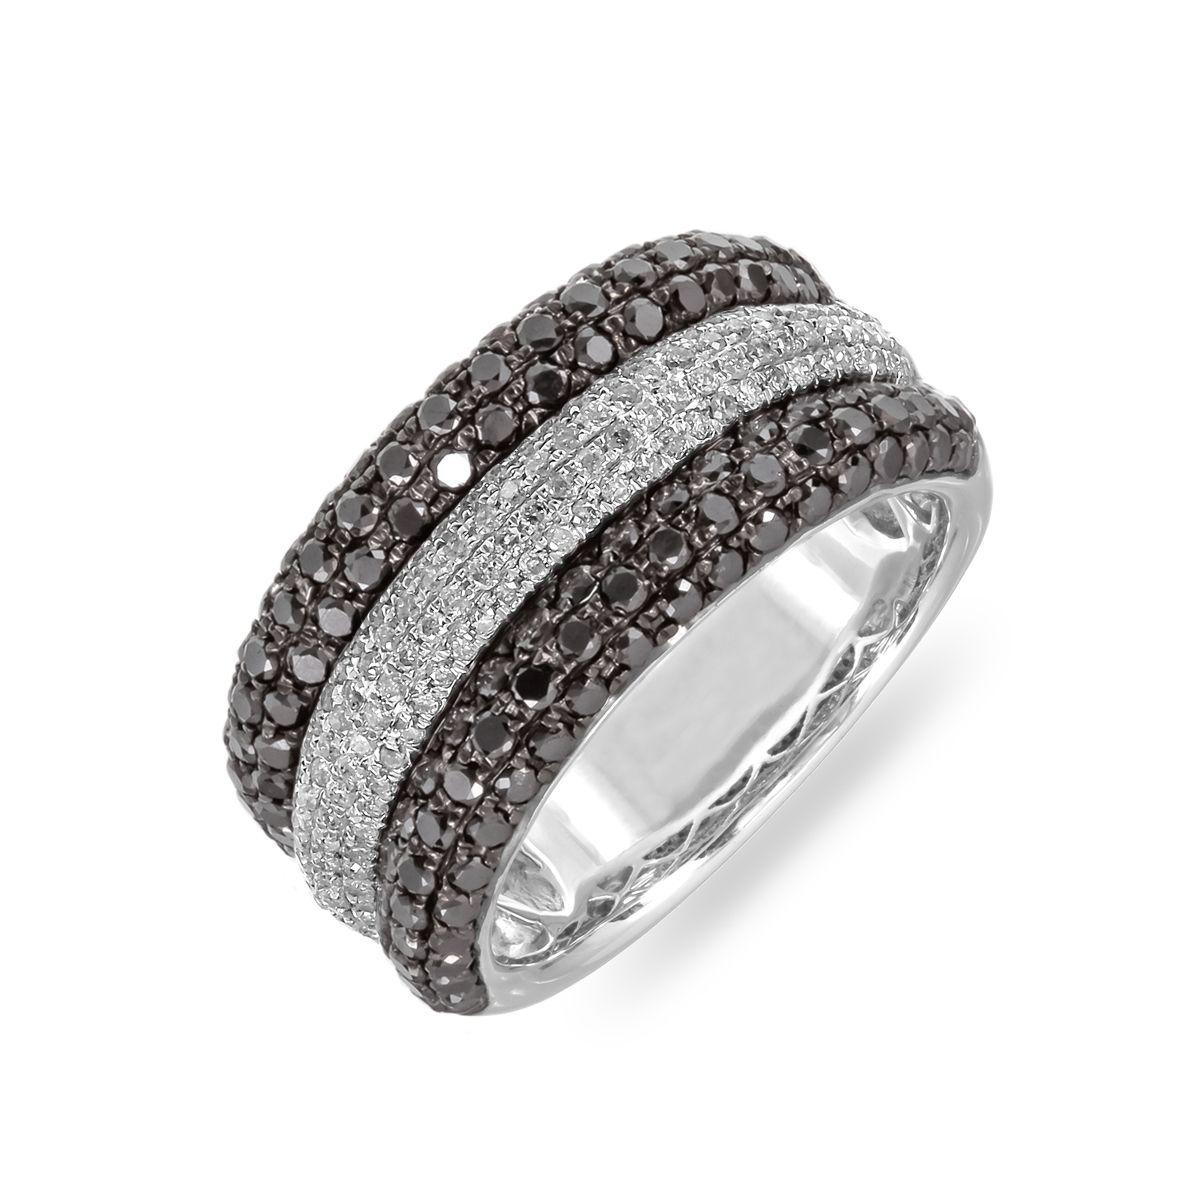 Striped black and white diamond ring<br /> at MissesDressy.com